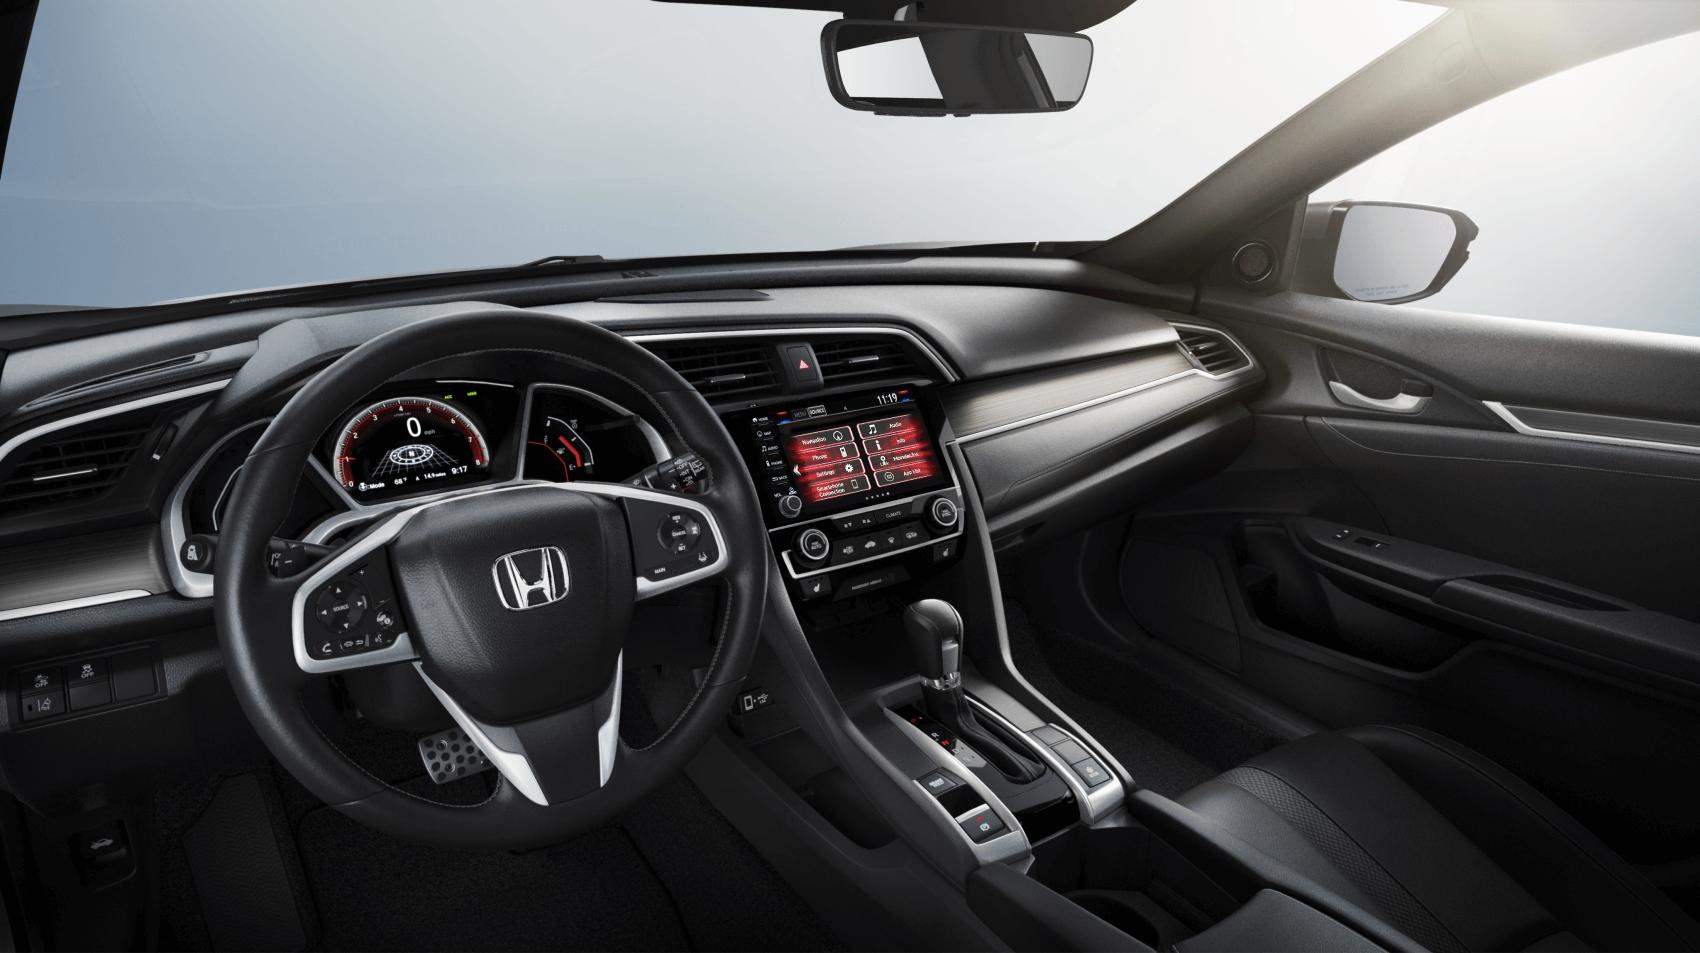 Honda Civic Interior Dashboard Tech